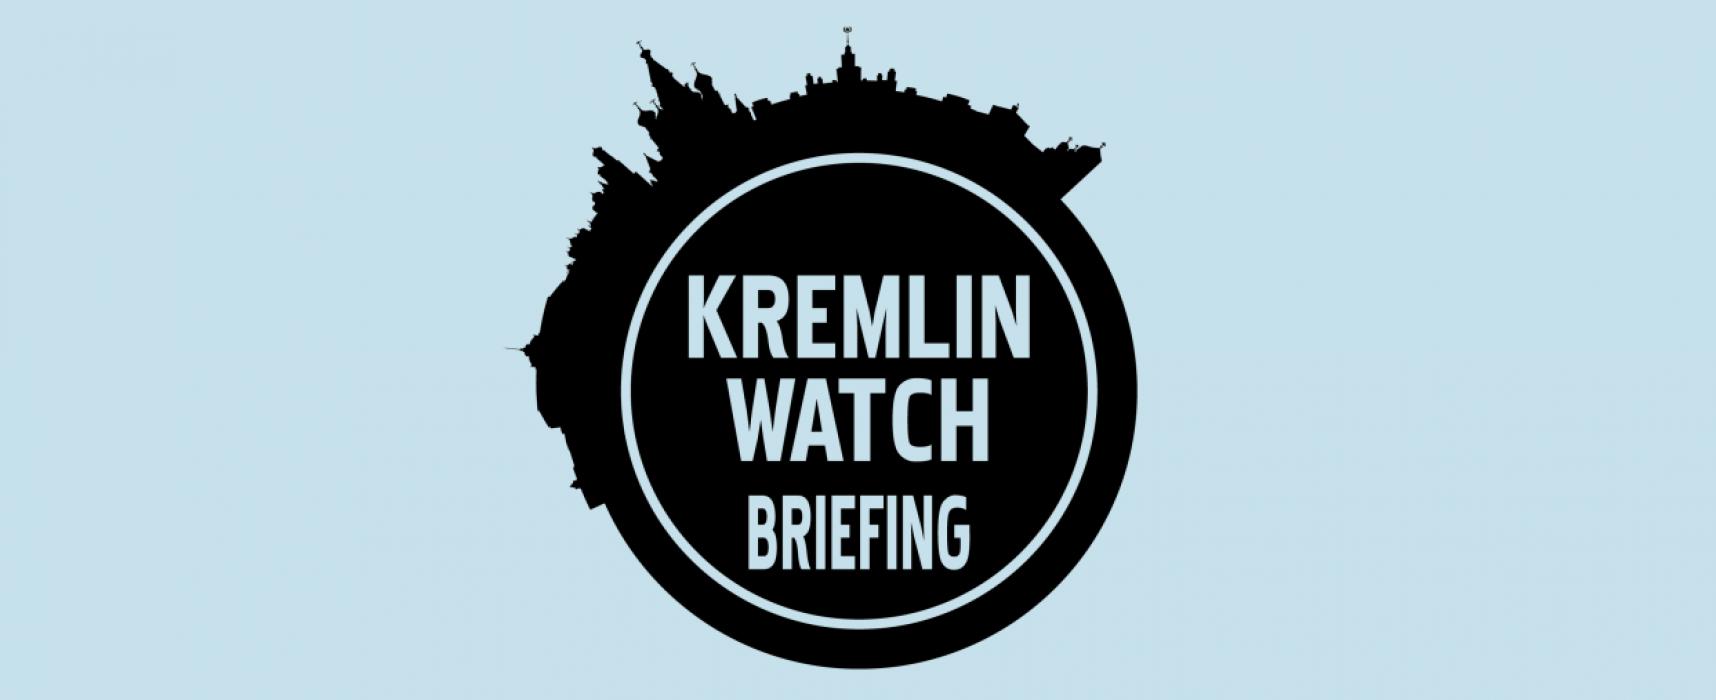 Kremlin Watch Briefing: Borrowing Russian money has a cost